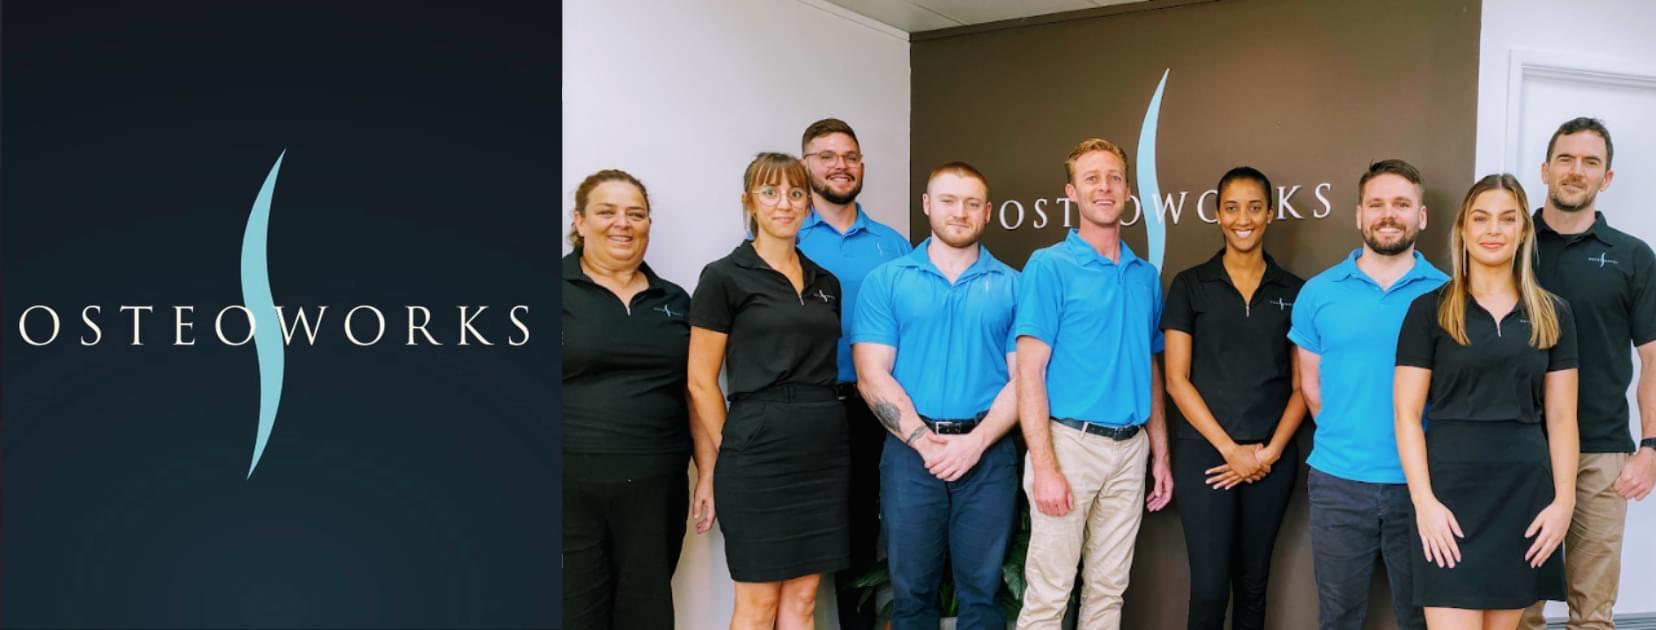 Brisbane osteopaths back pain neck pain experts